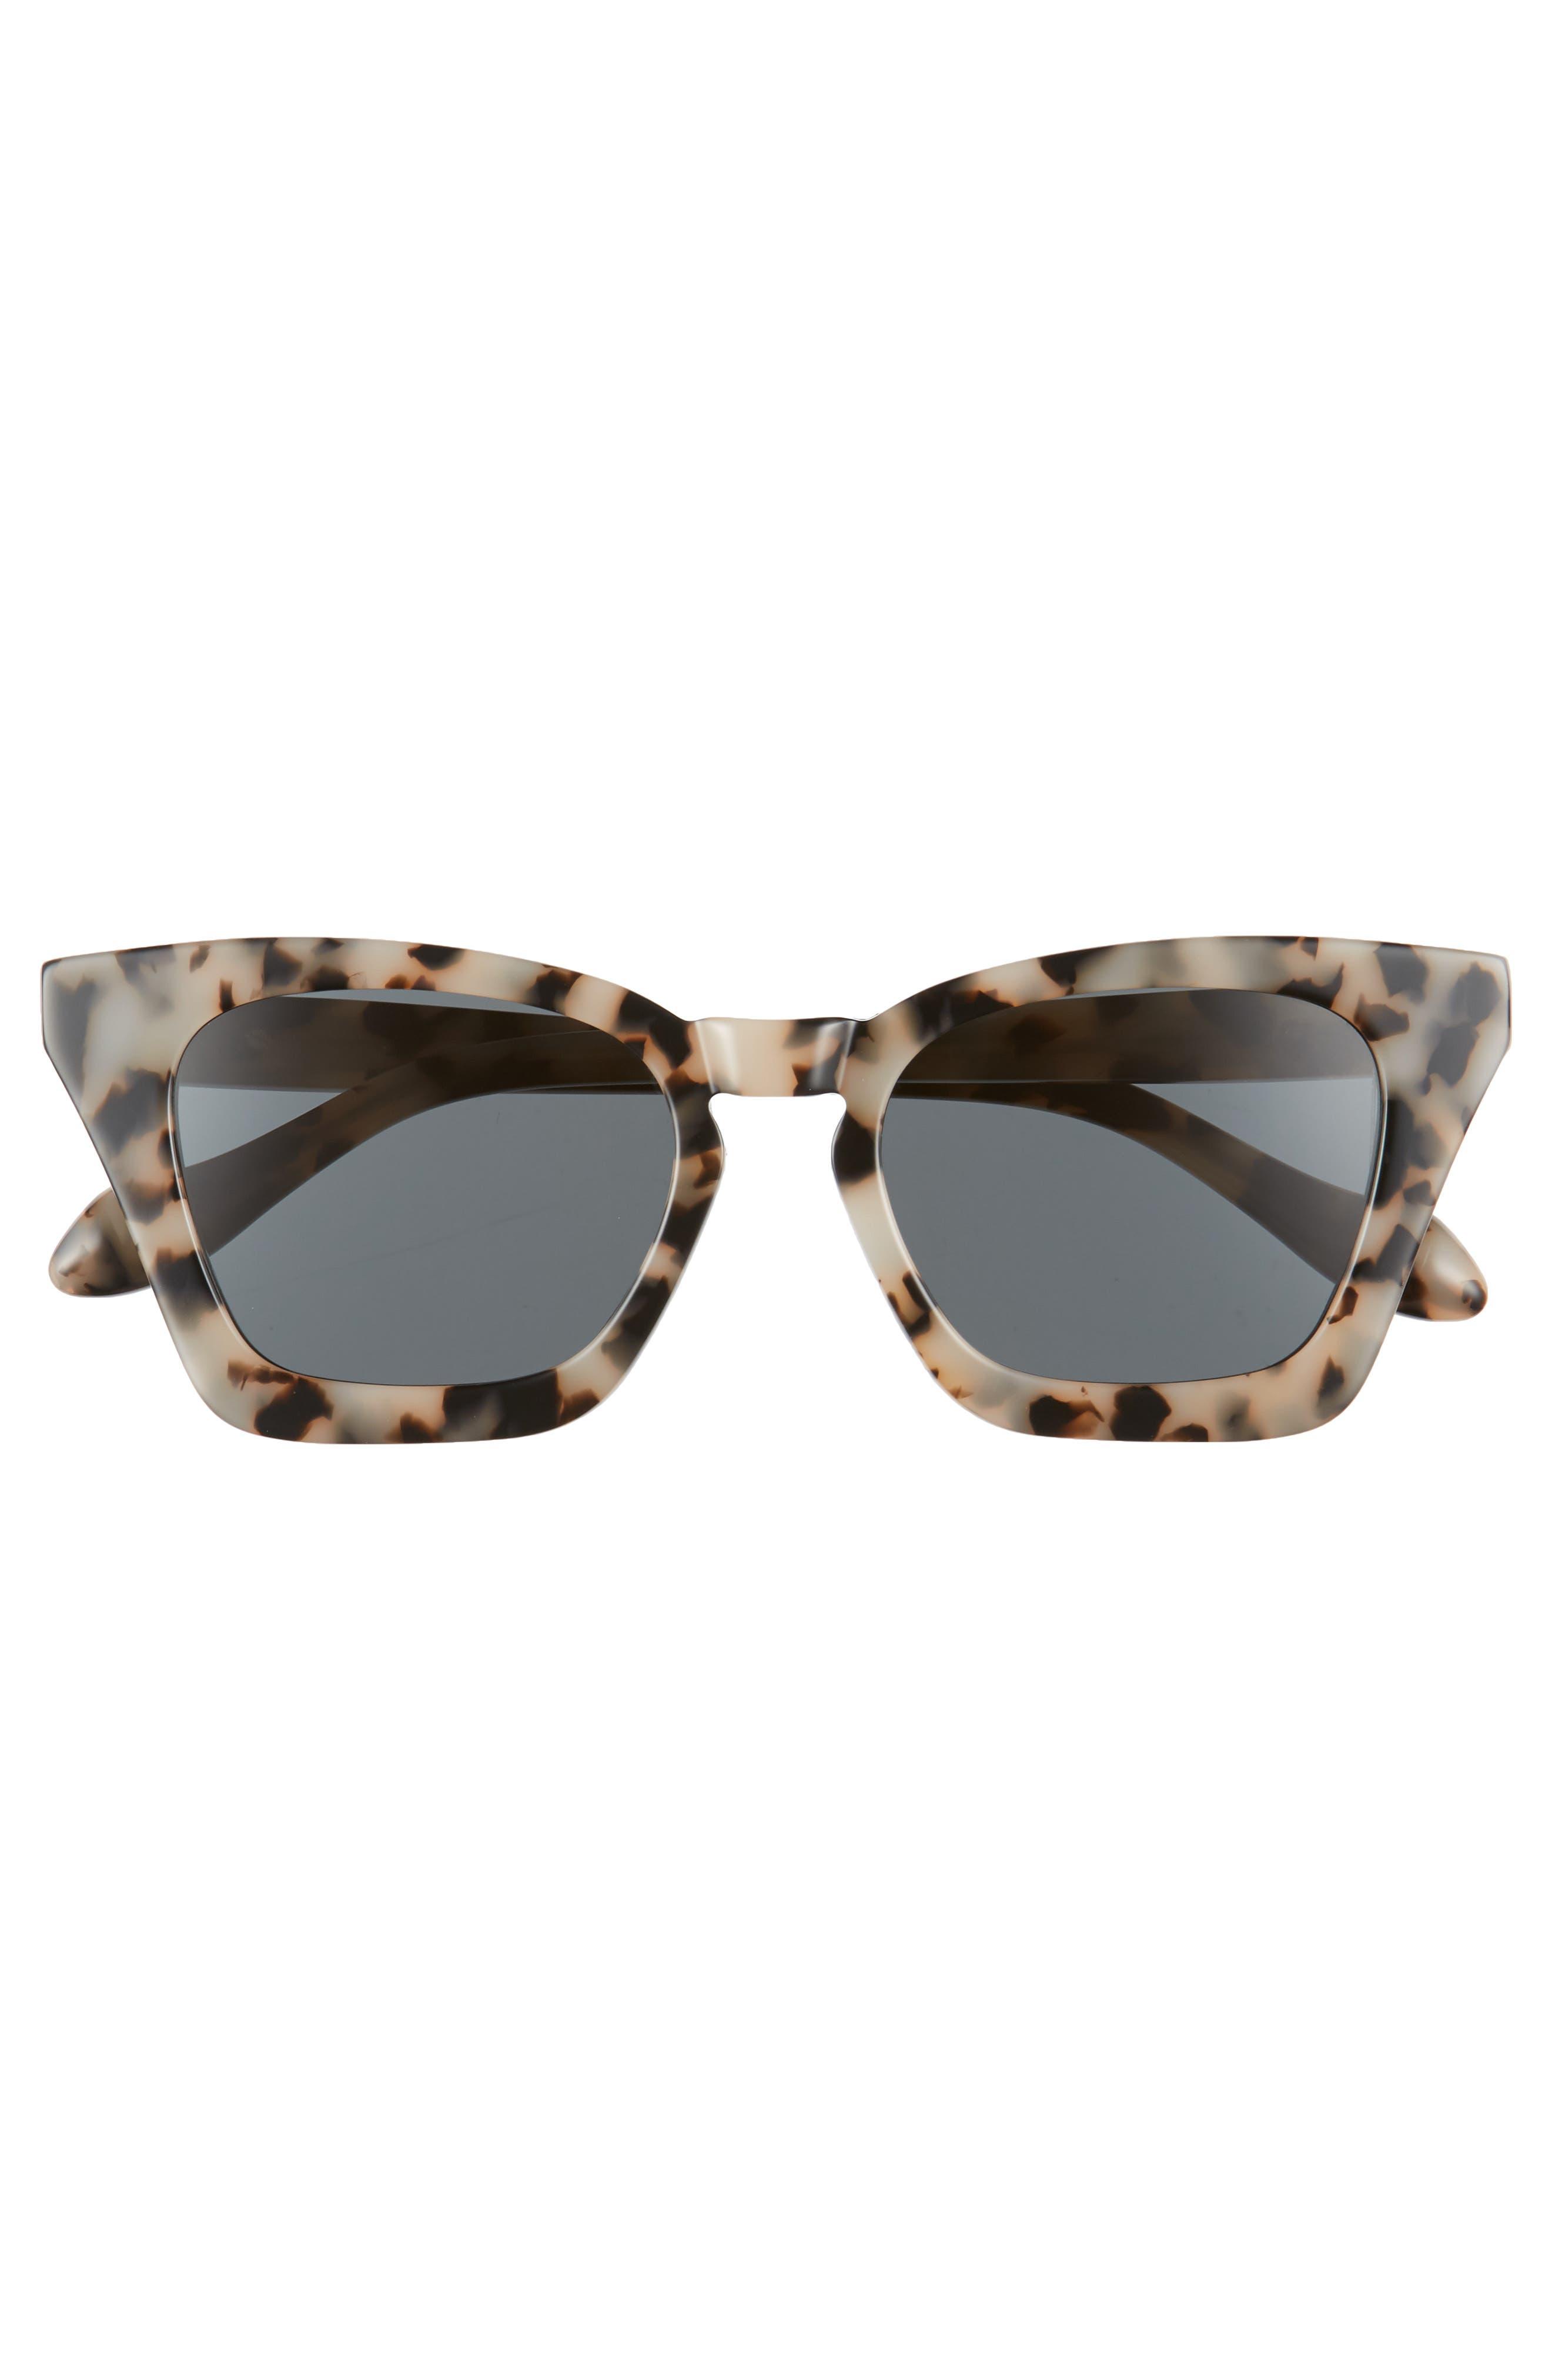 Ginza 50mm Cat Eye Sunglasses,                             Alternate thumbnail 3, color,                             Milk Tortoise/ Black Solid